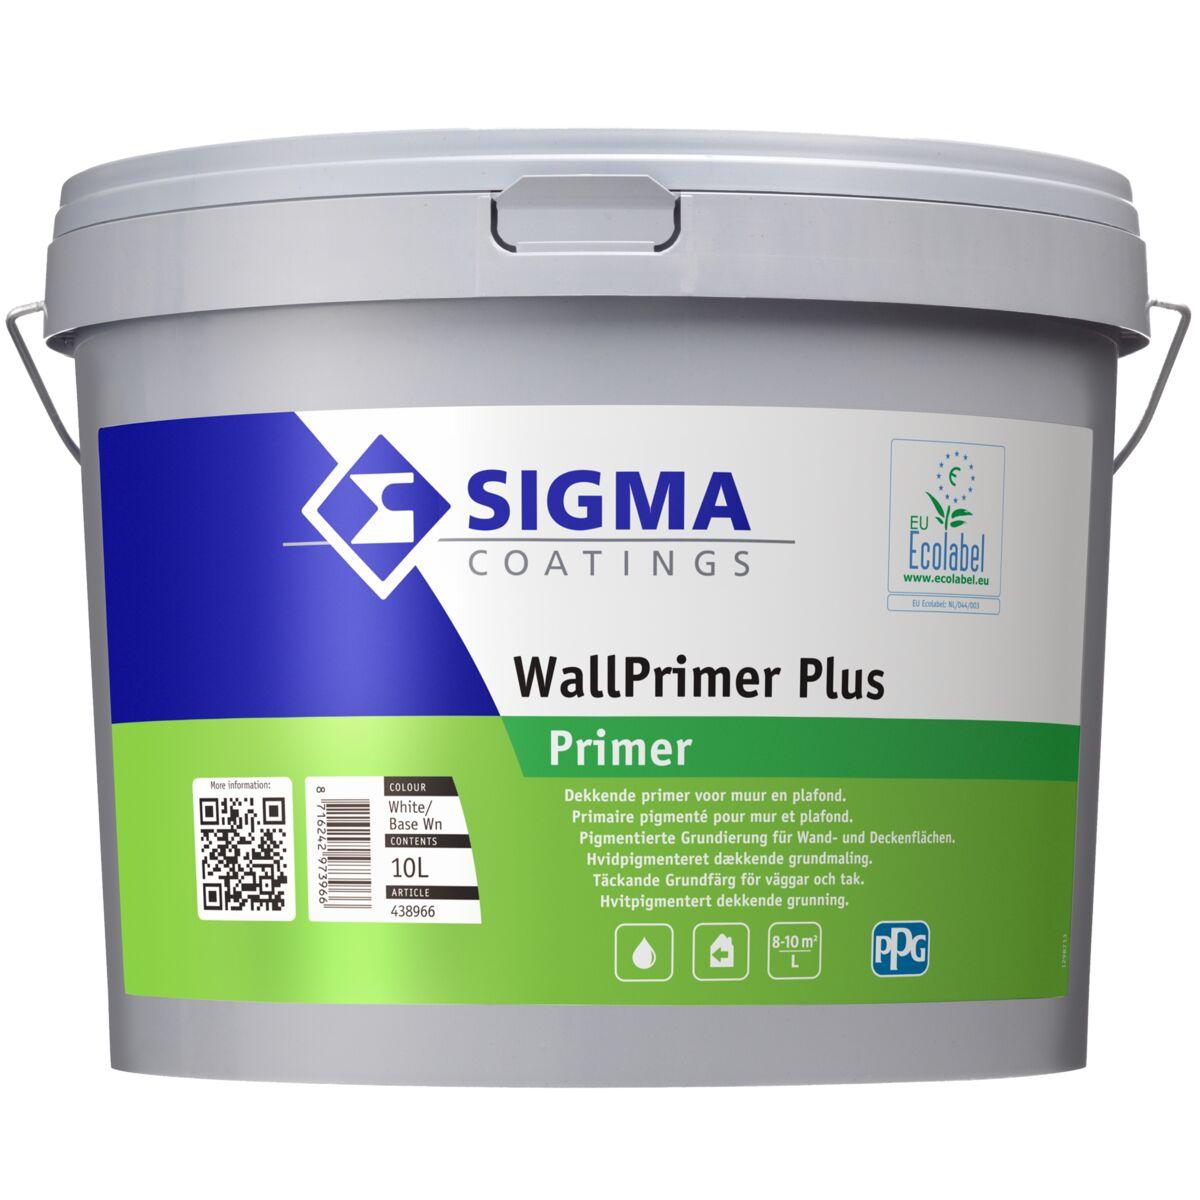 WallPrimer Plus